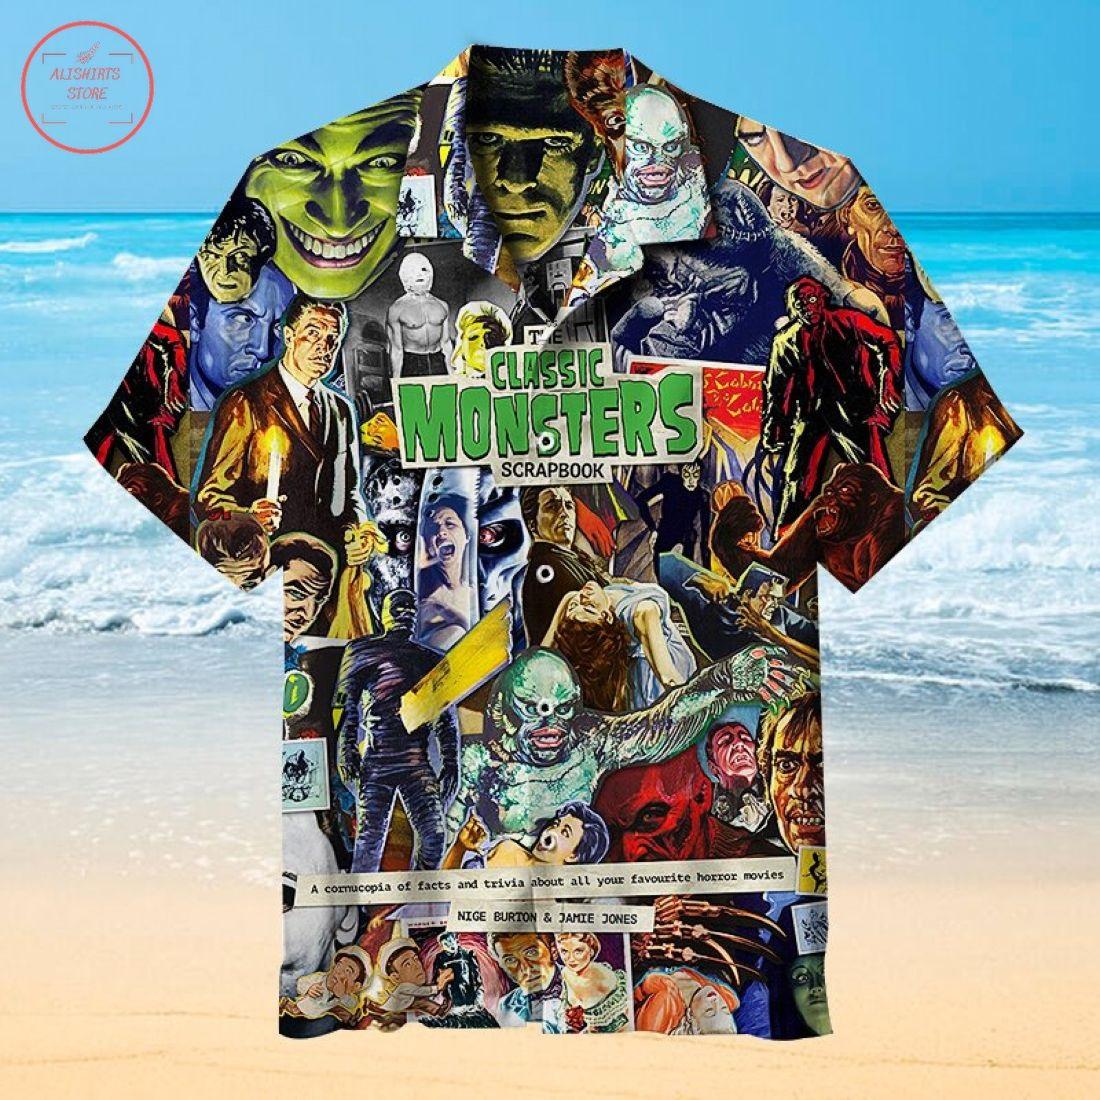 Classic Monsters Scrapbook Hawaiian Shirt